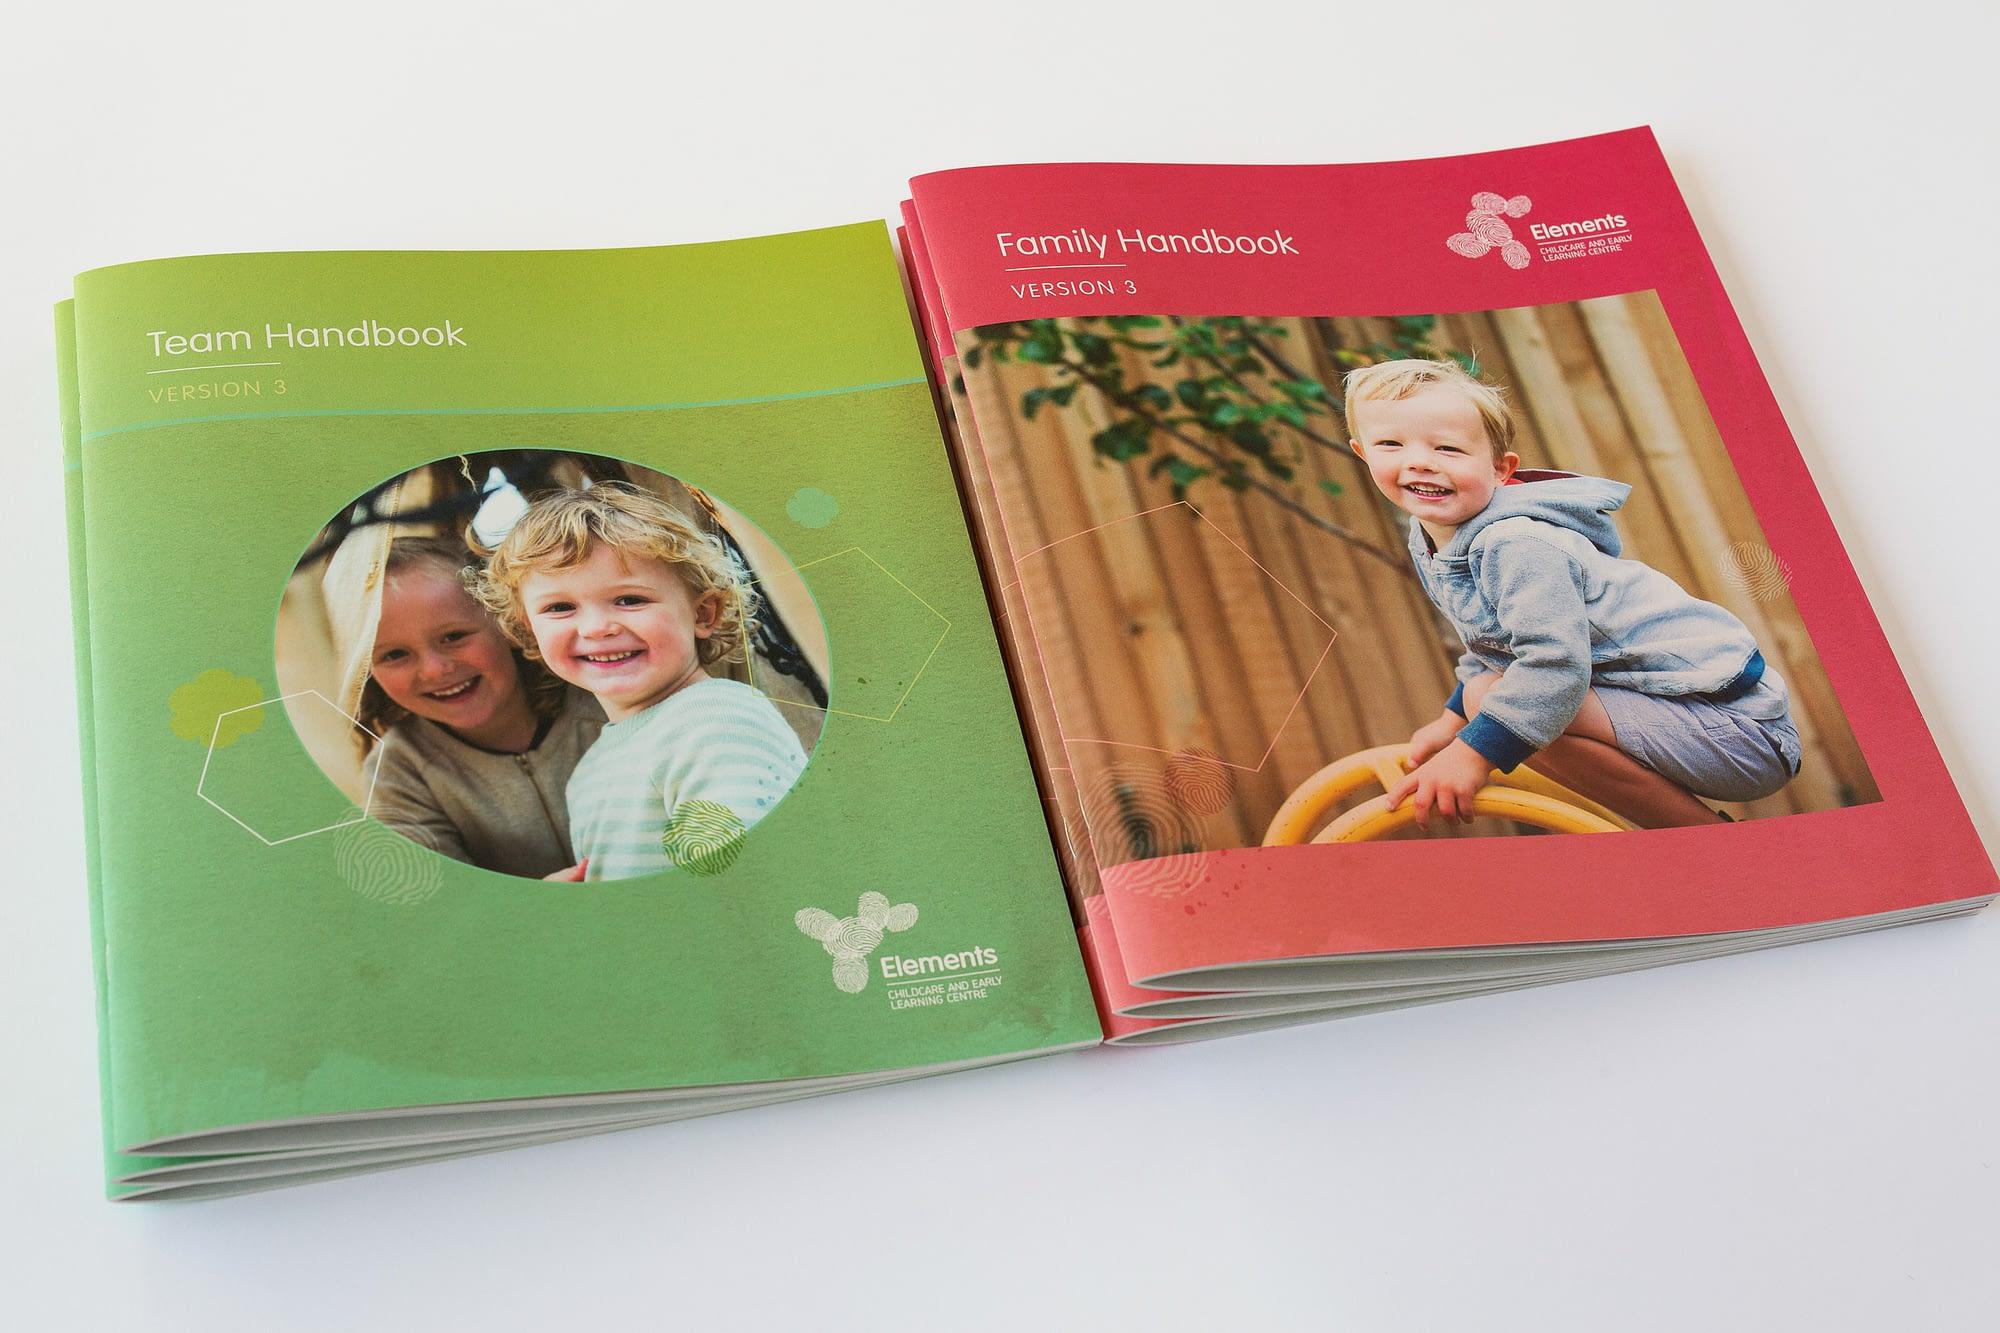 Elements Handbook covers